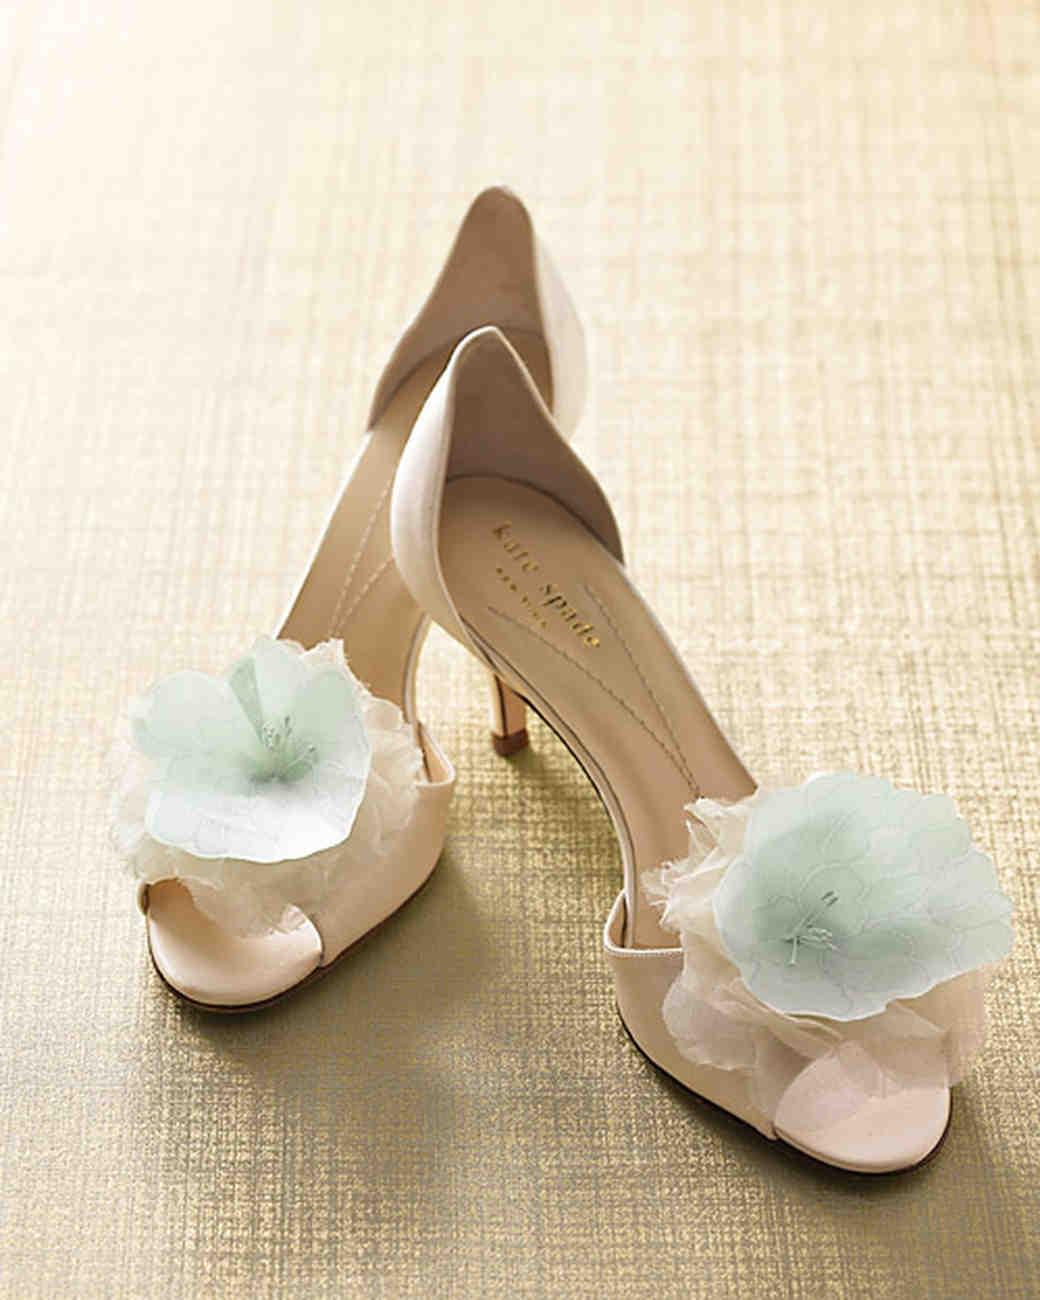 mwd104646_spr09_shoes.jpg